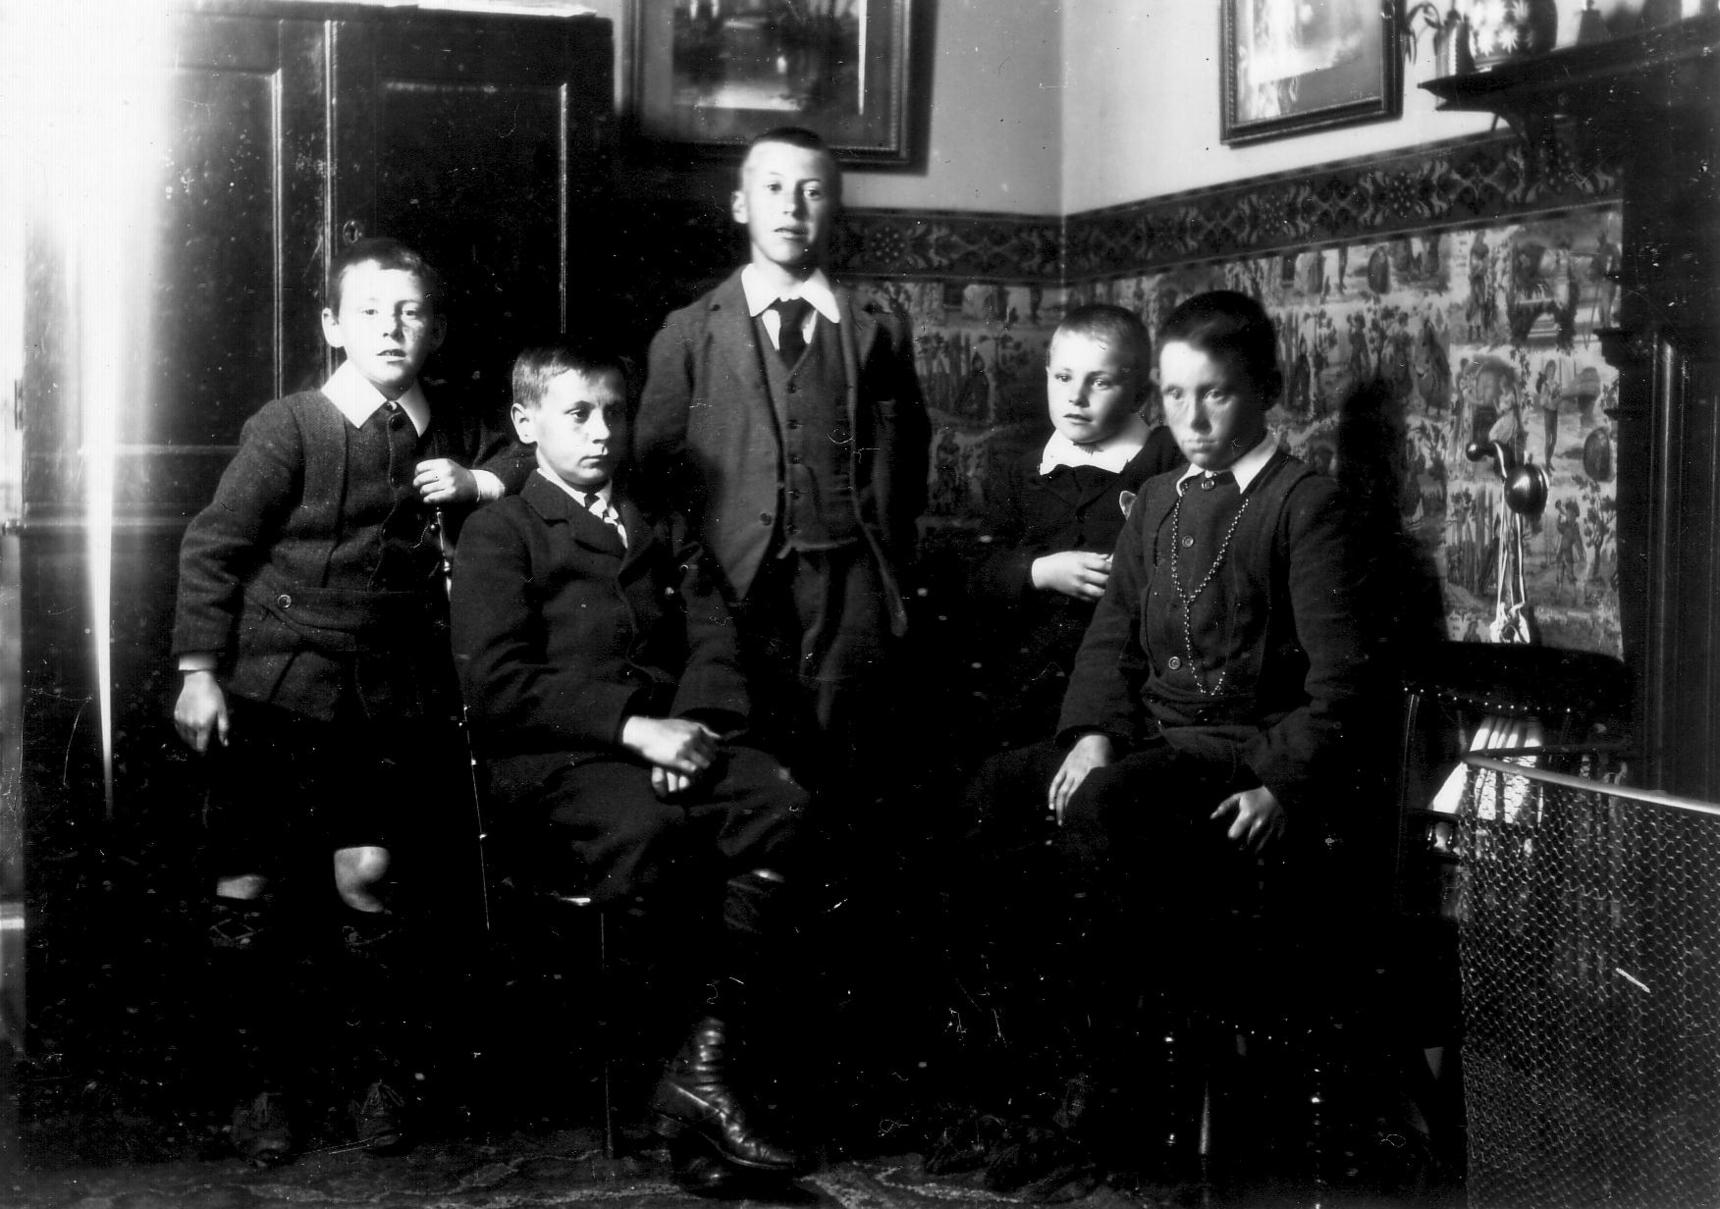 Group Of Schoolboys Standing In Corner Of Room By Fireside c.1906